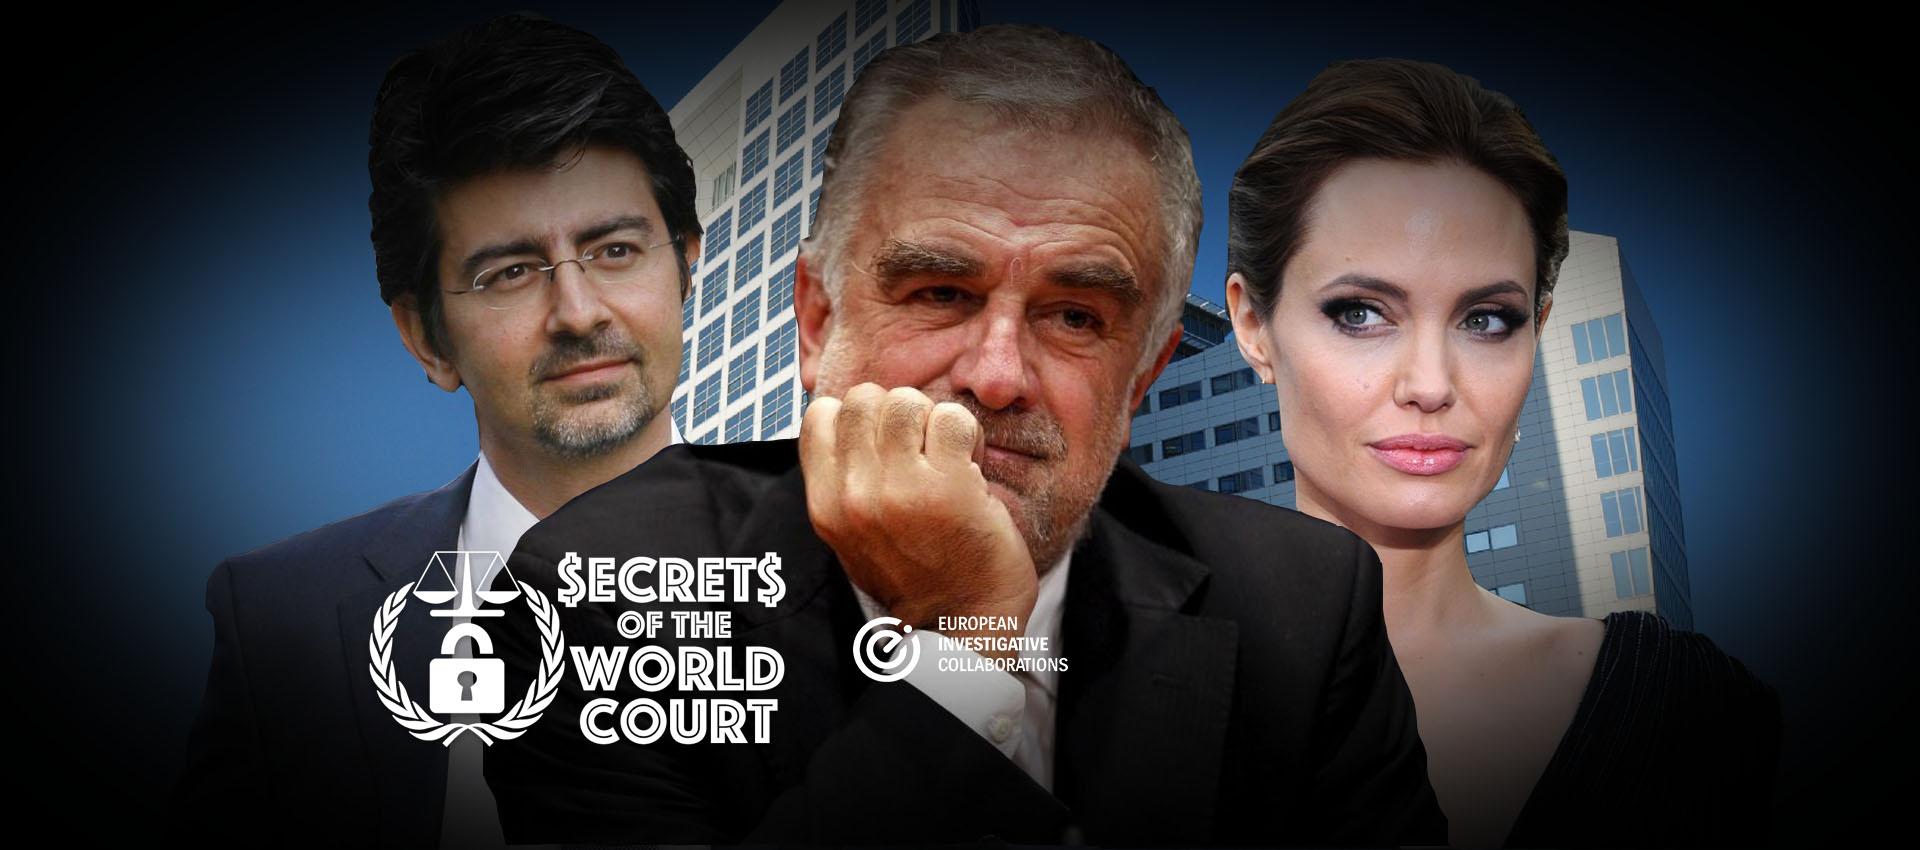 Angelina Jolie, Omidyar i Katar: tajni kabinet tužitelja Ocampe